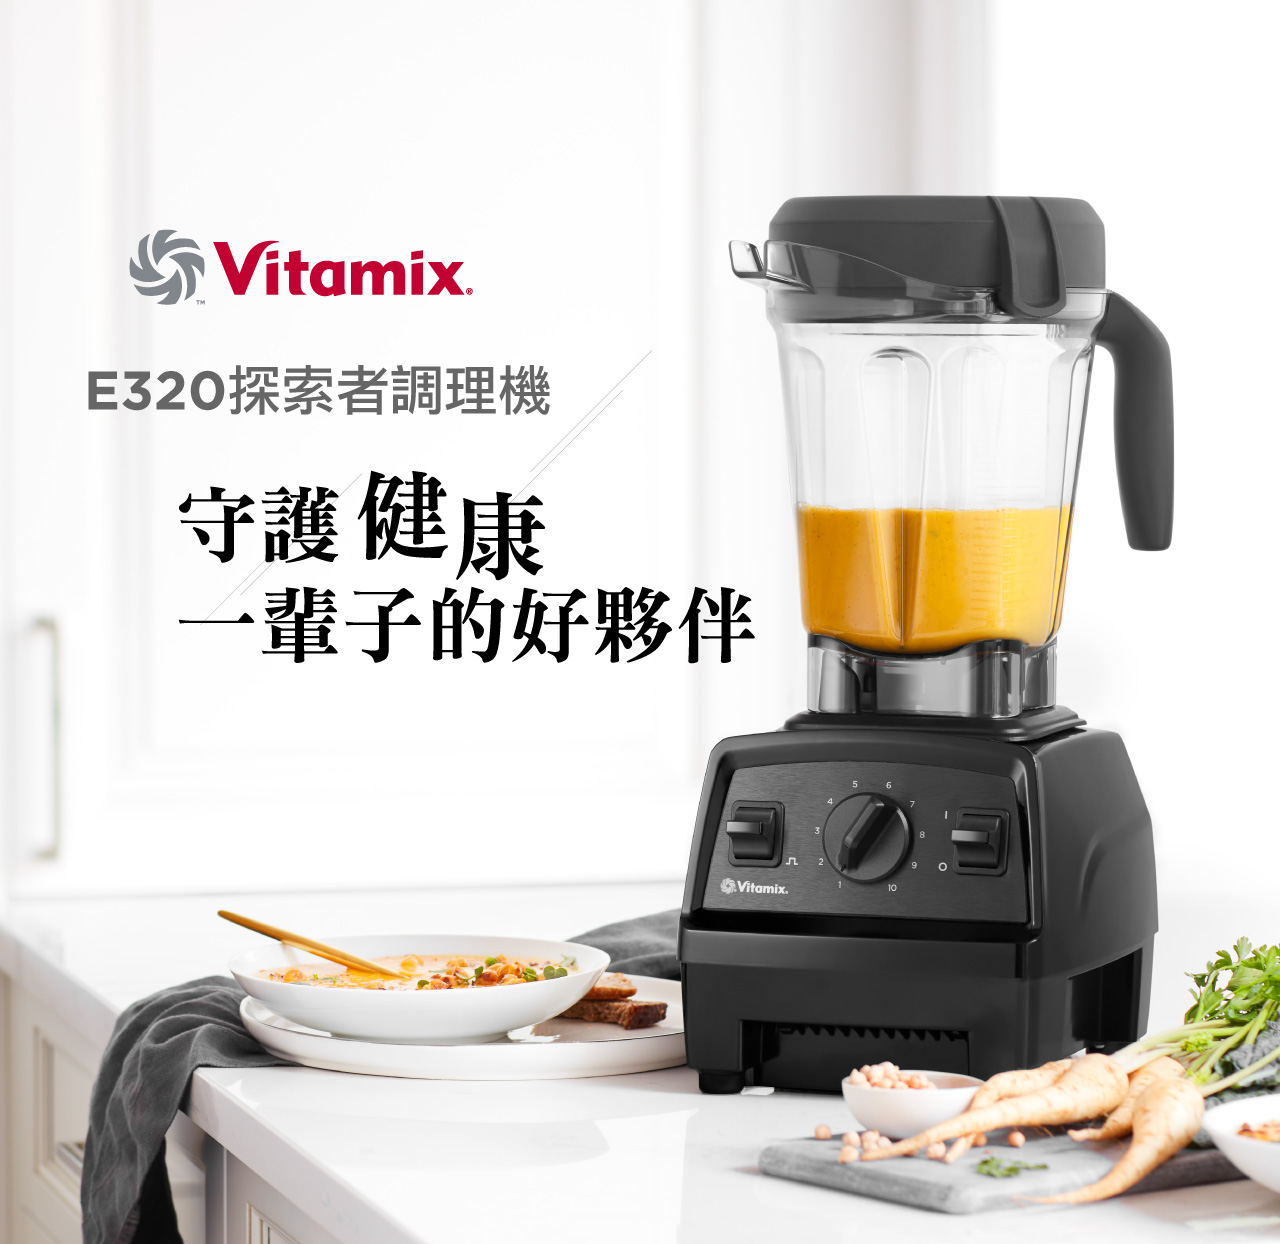 Vitamix_E320_調理機_COSTCO好市多_美式賣場_限量展售